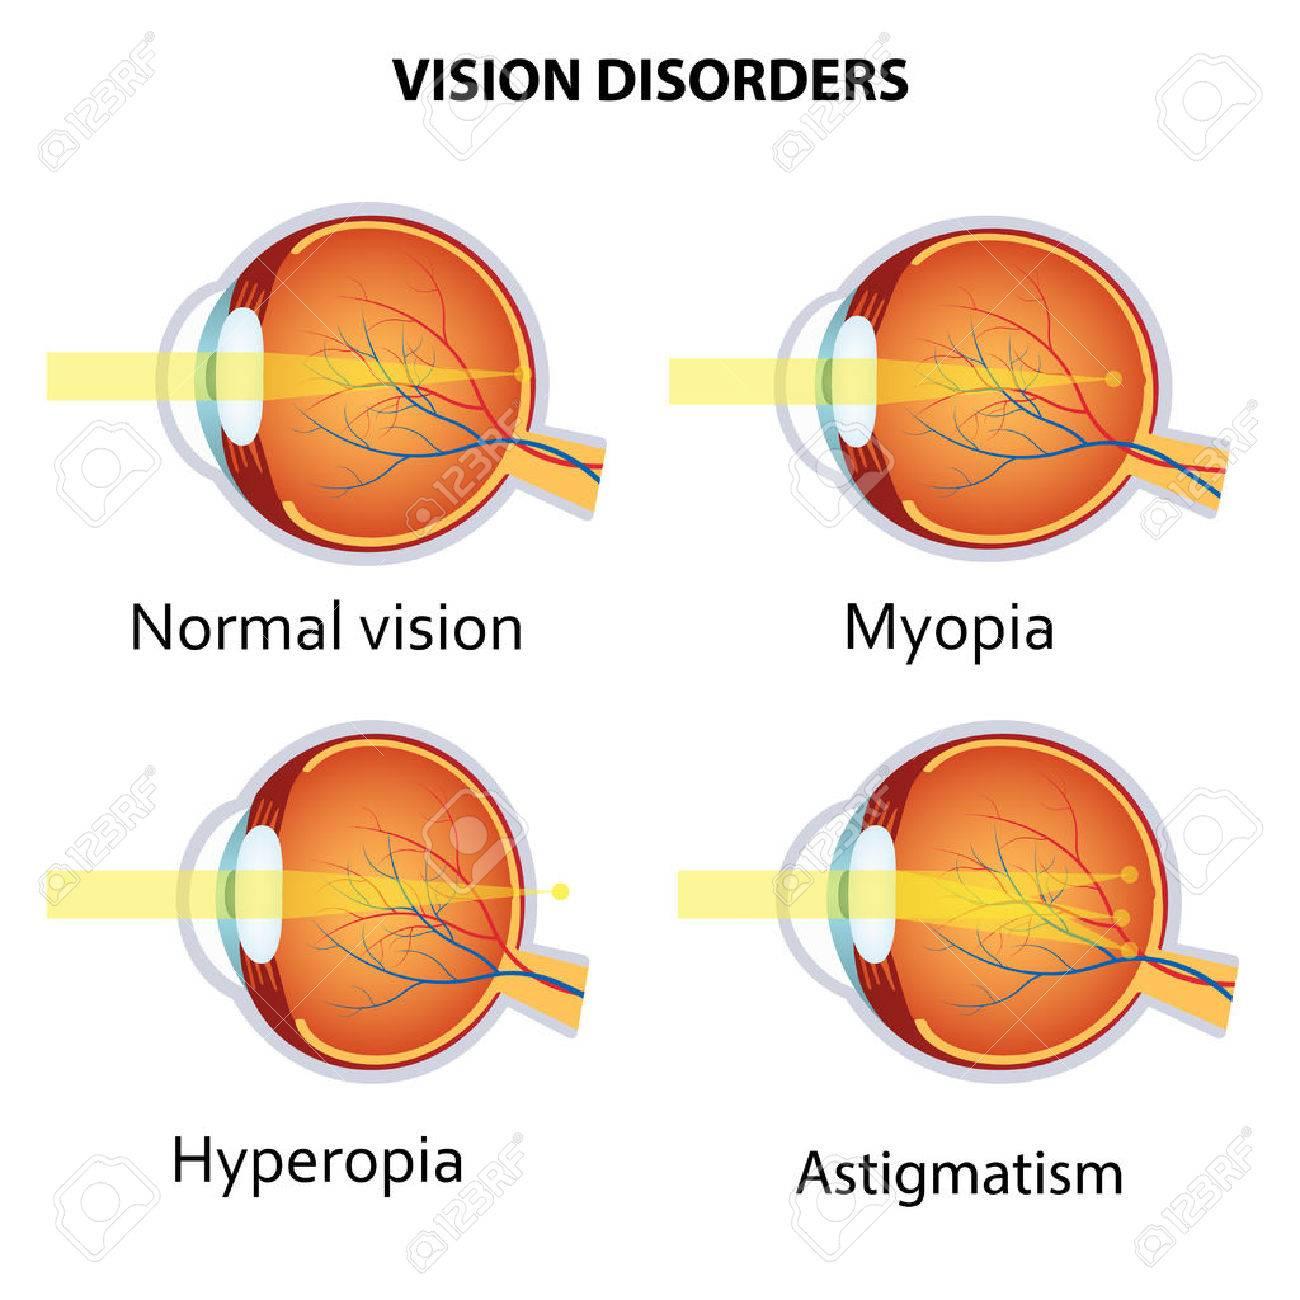 myopia, de hyperopia is)